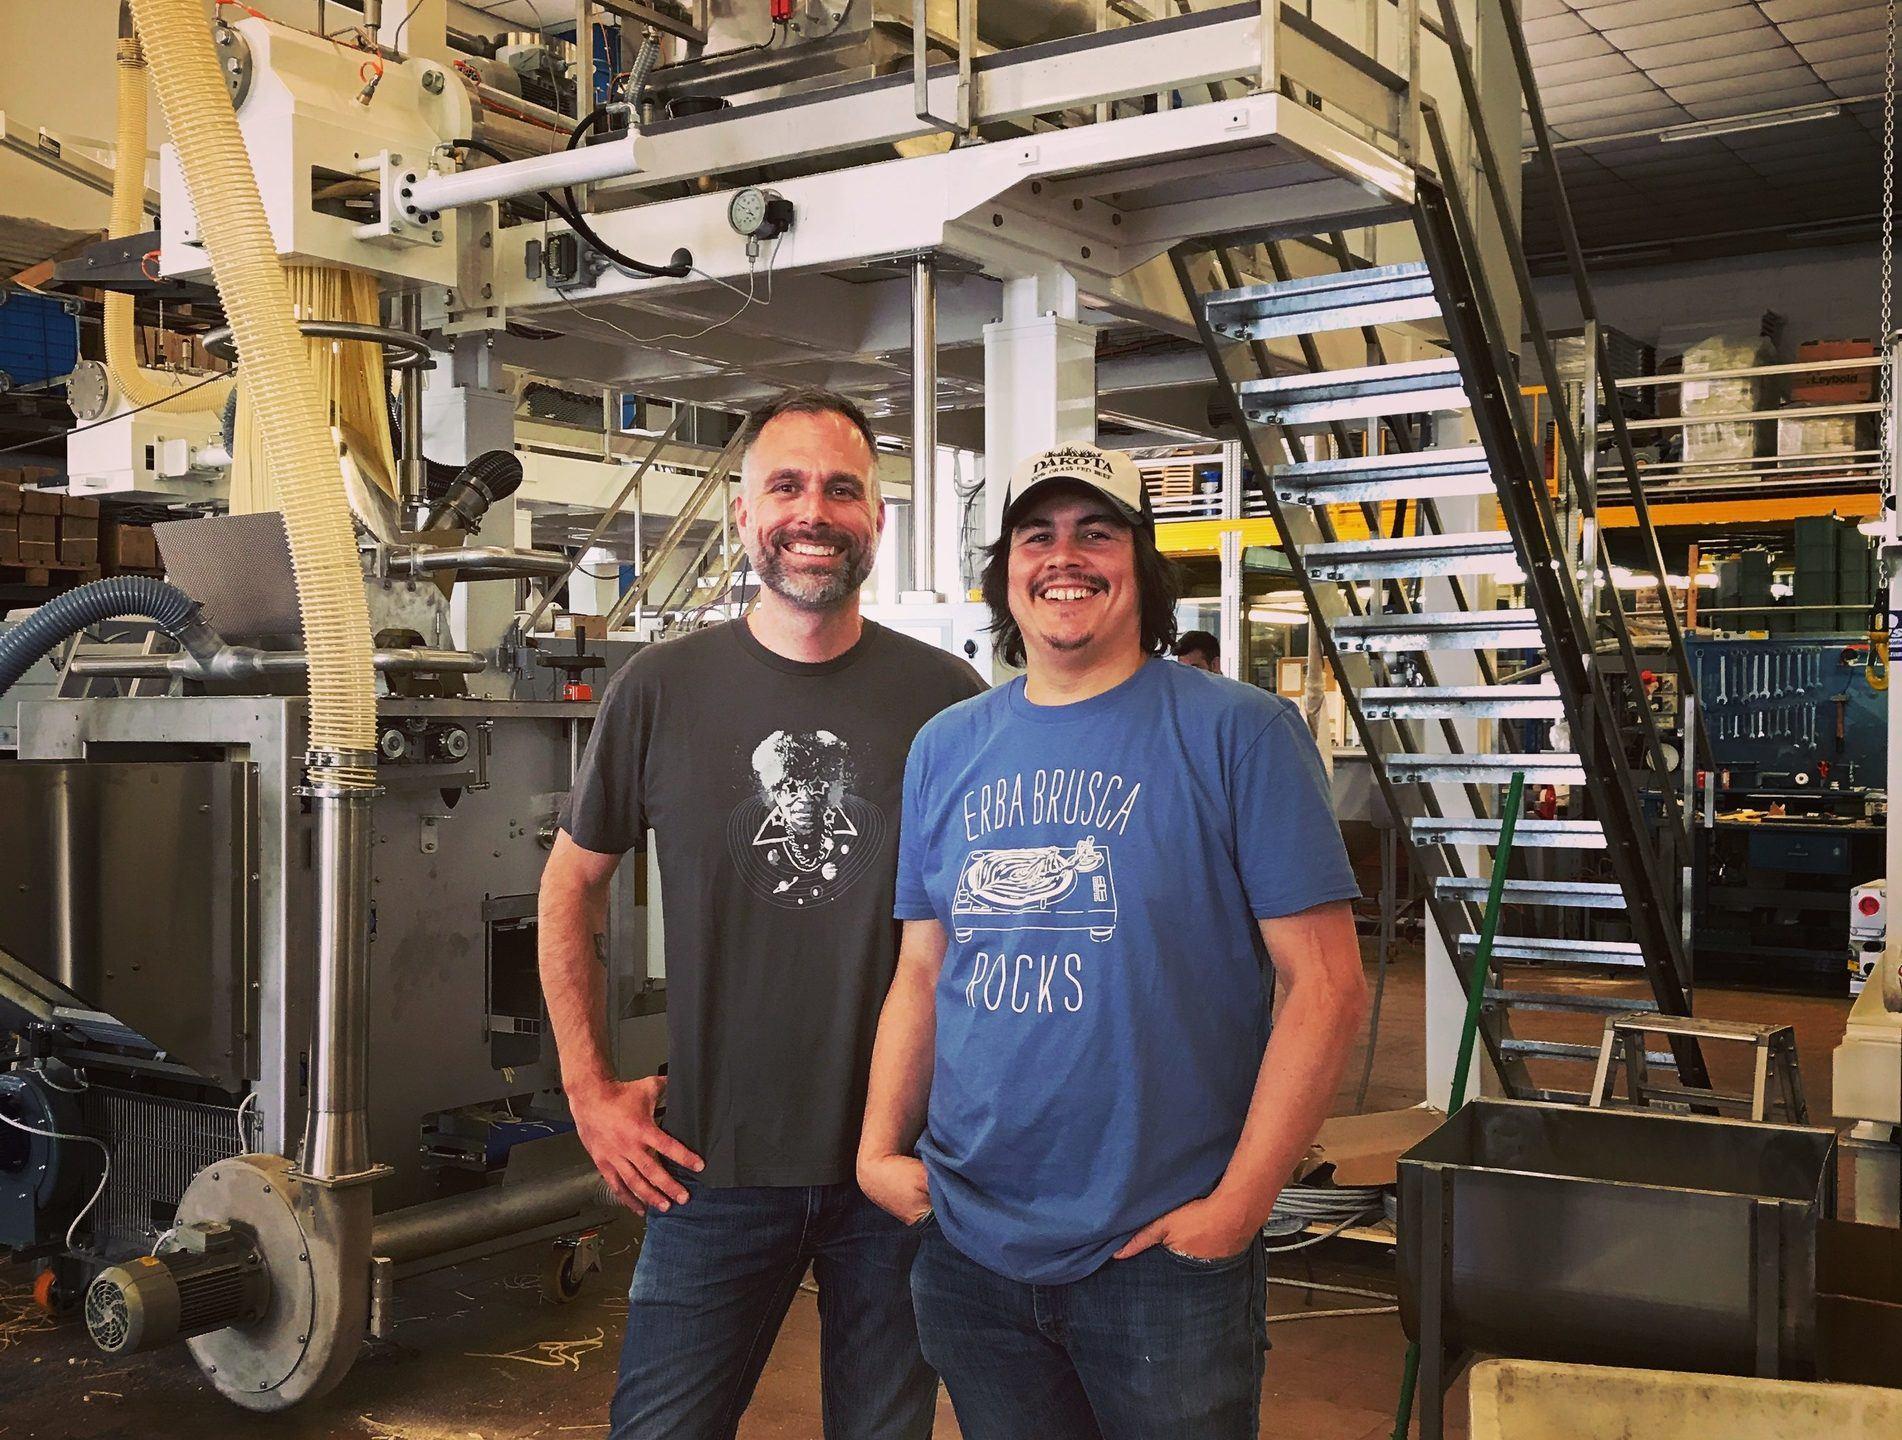 Sfoglini founders Steve Gonzalez and Scott Ketchum pose in their pasta factory. Sfoglini founders Steve Gonzalez and Scott Ketchum created their unique hemp pasta after visiting an organic hemp farm in New York state.